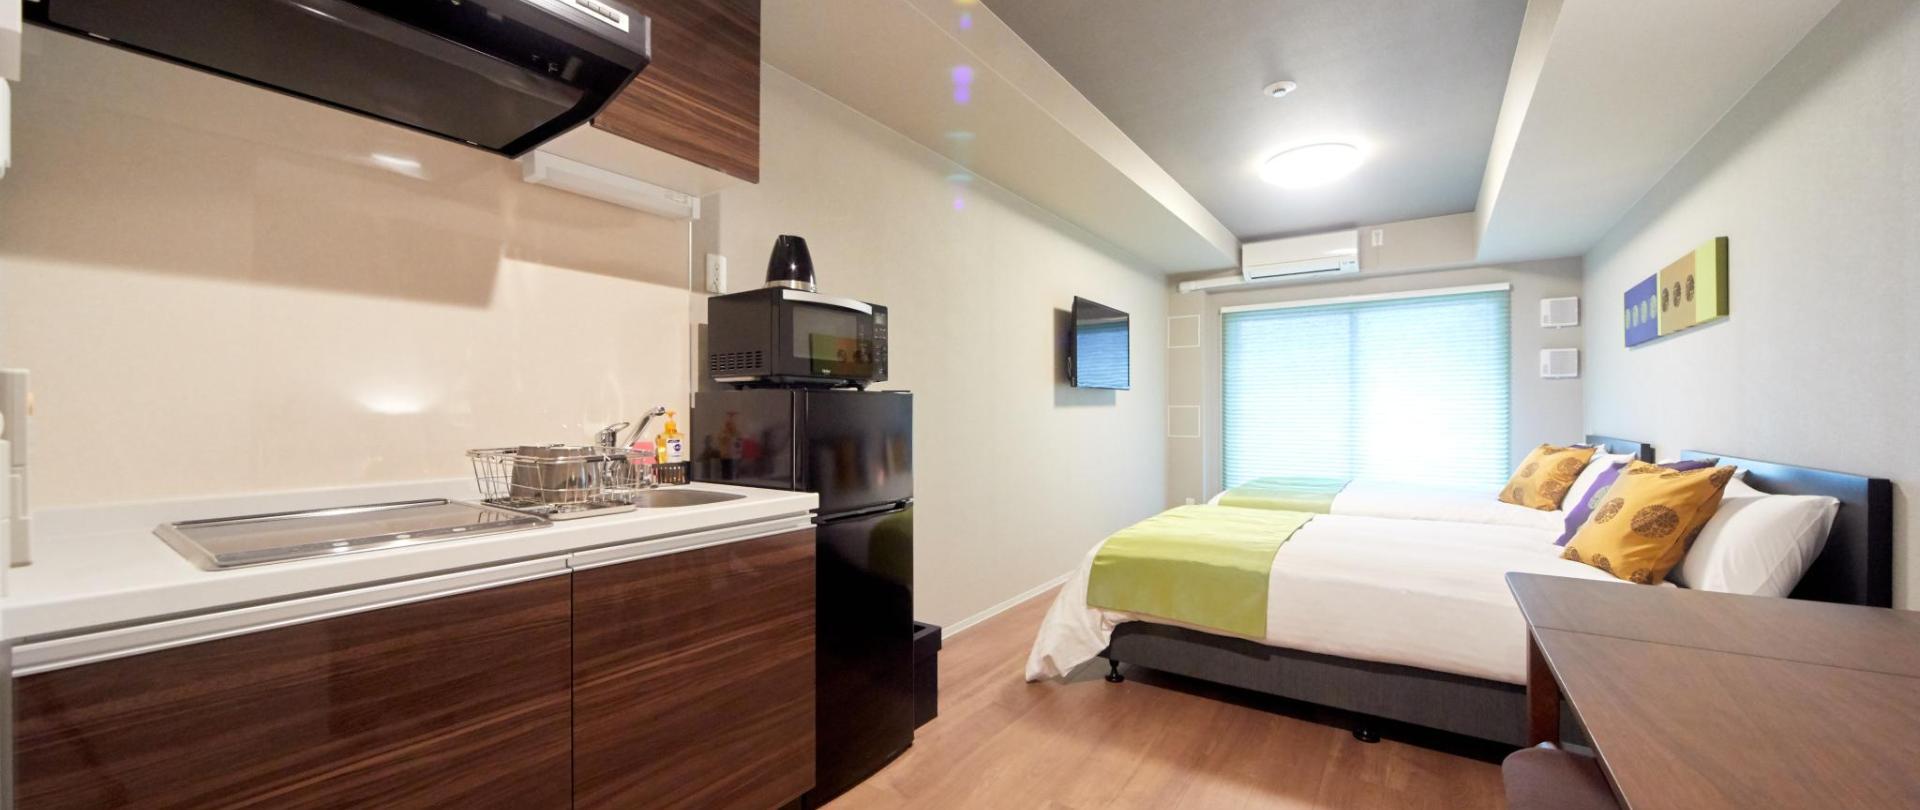 181217_HotelMondonce_202.jpg